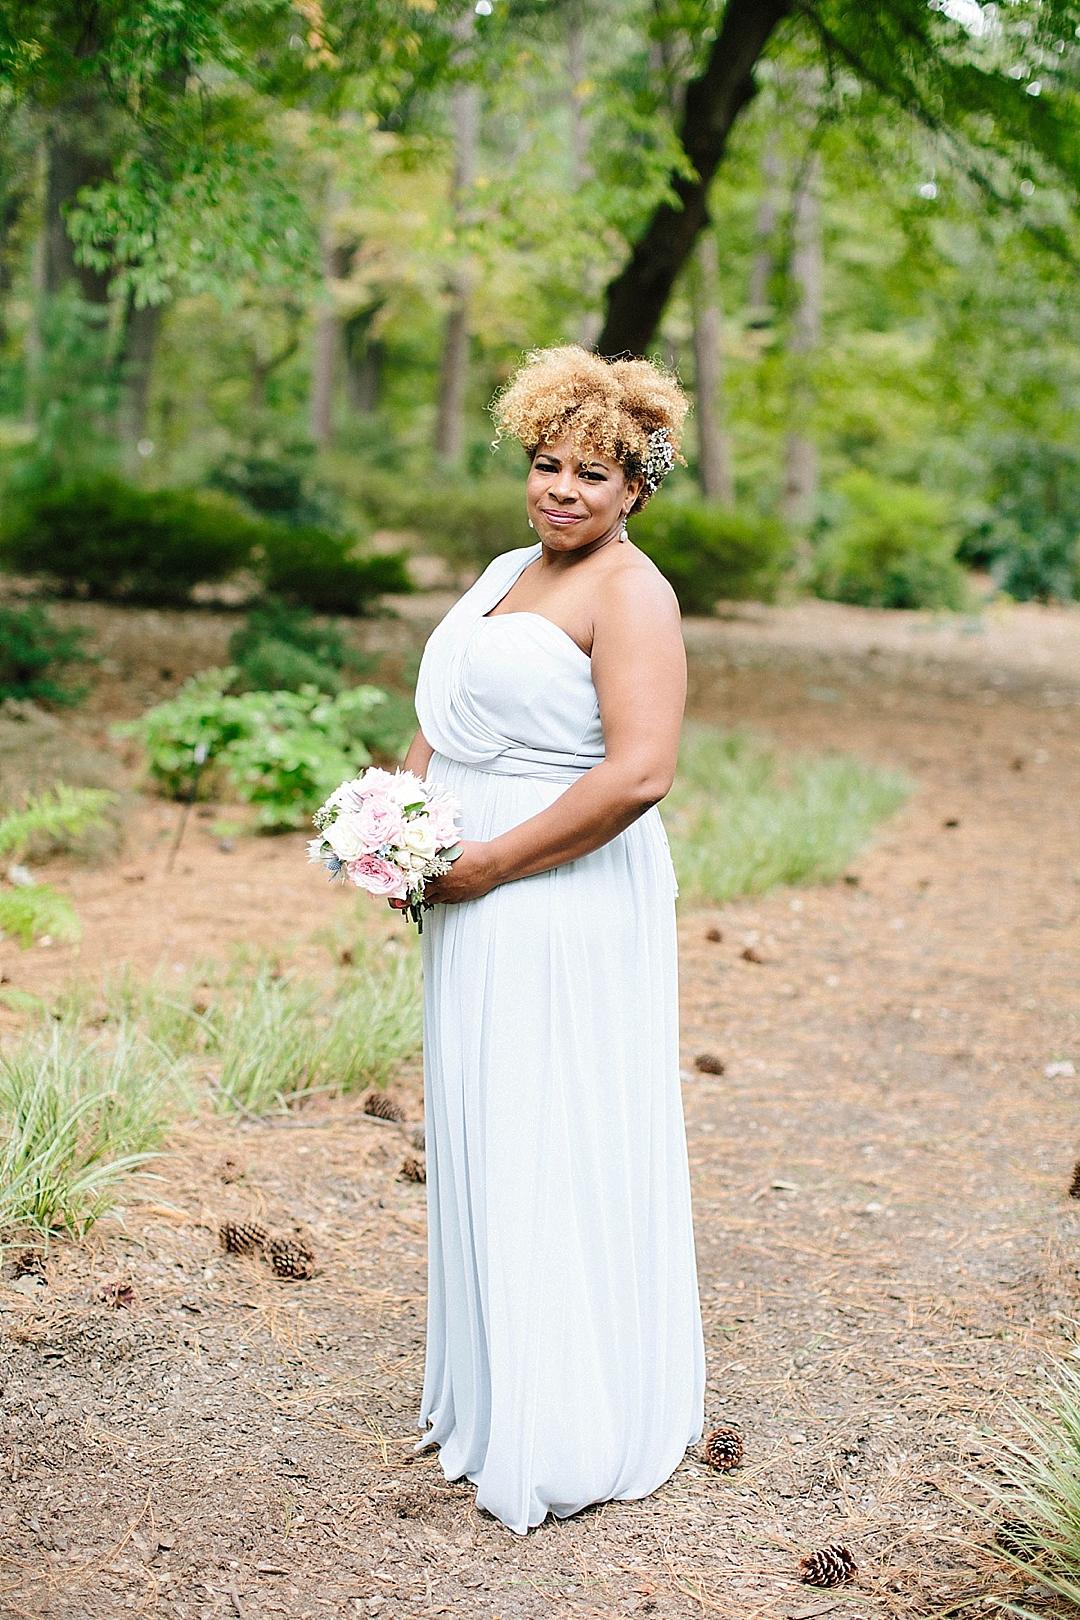 davids bridal for aisle society - bridesmaids dresses